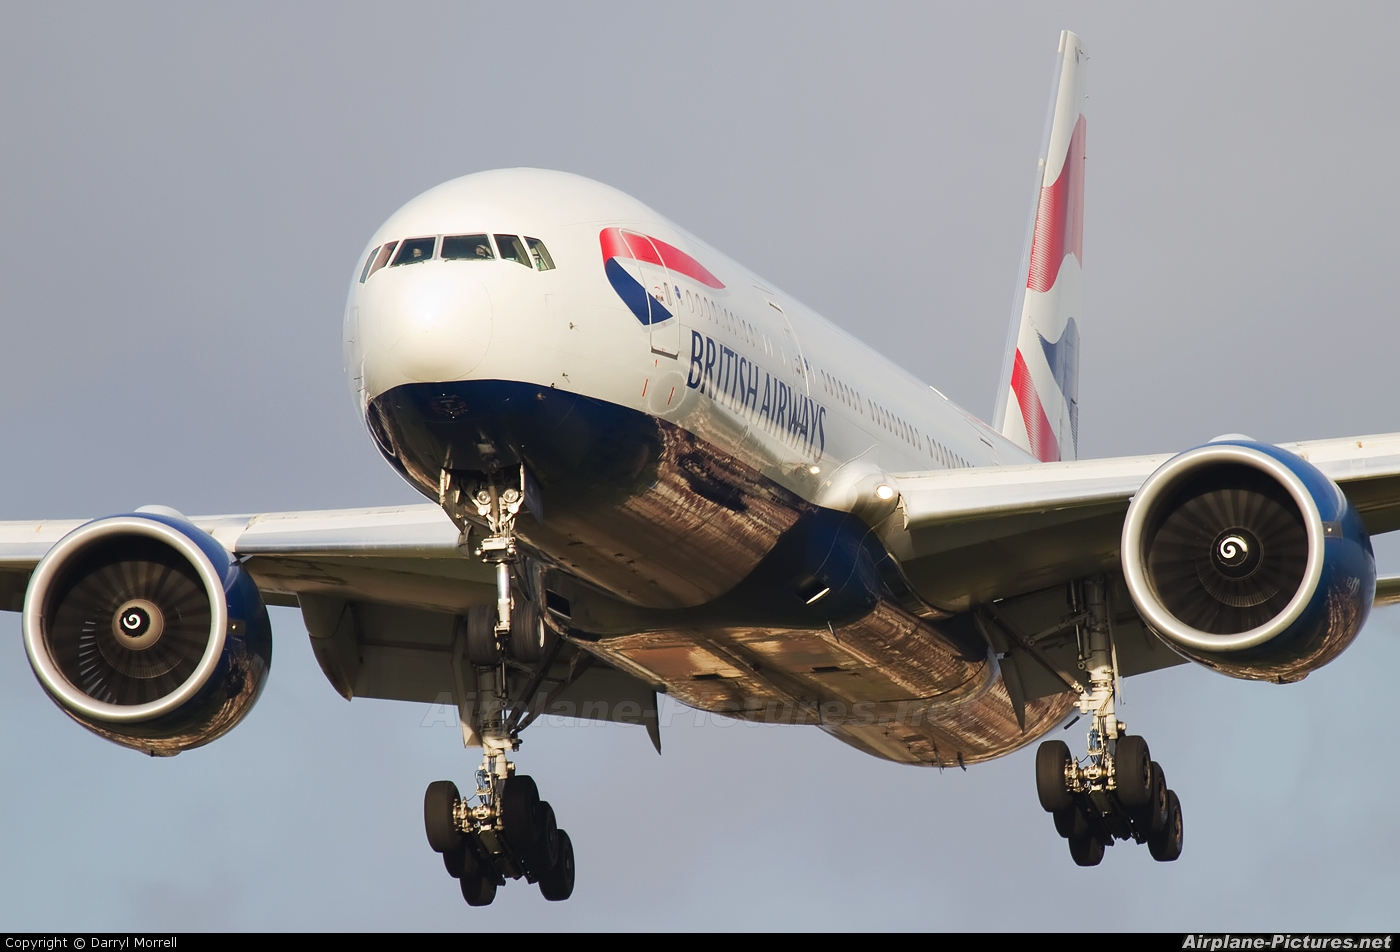 British Airways G-VIIW aircraft at London - Heathrow